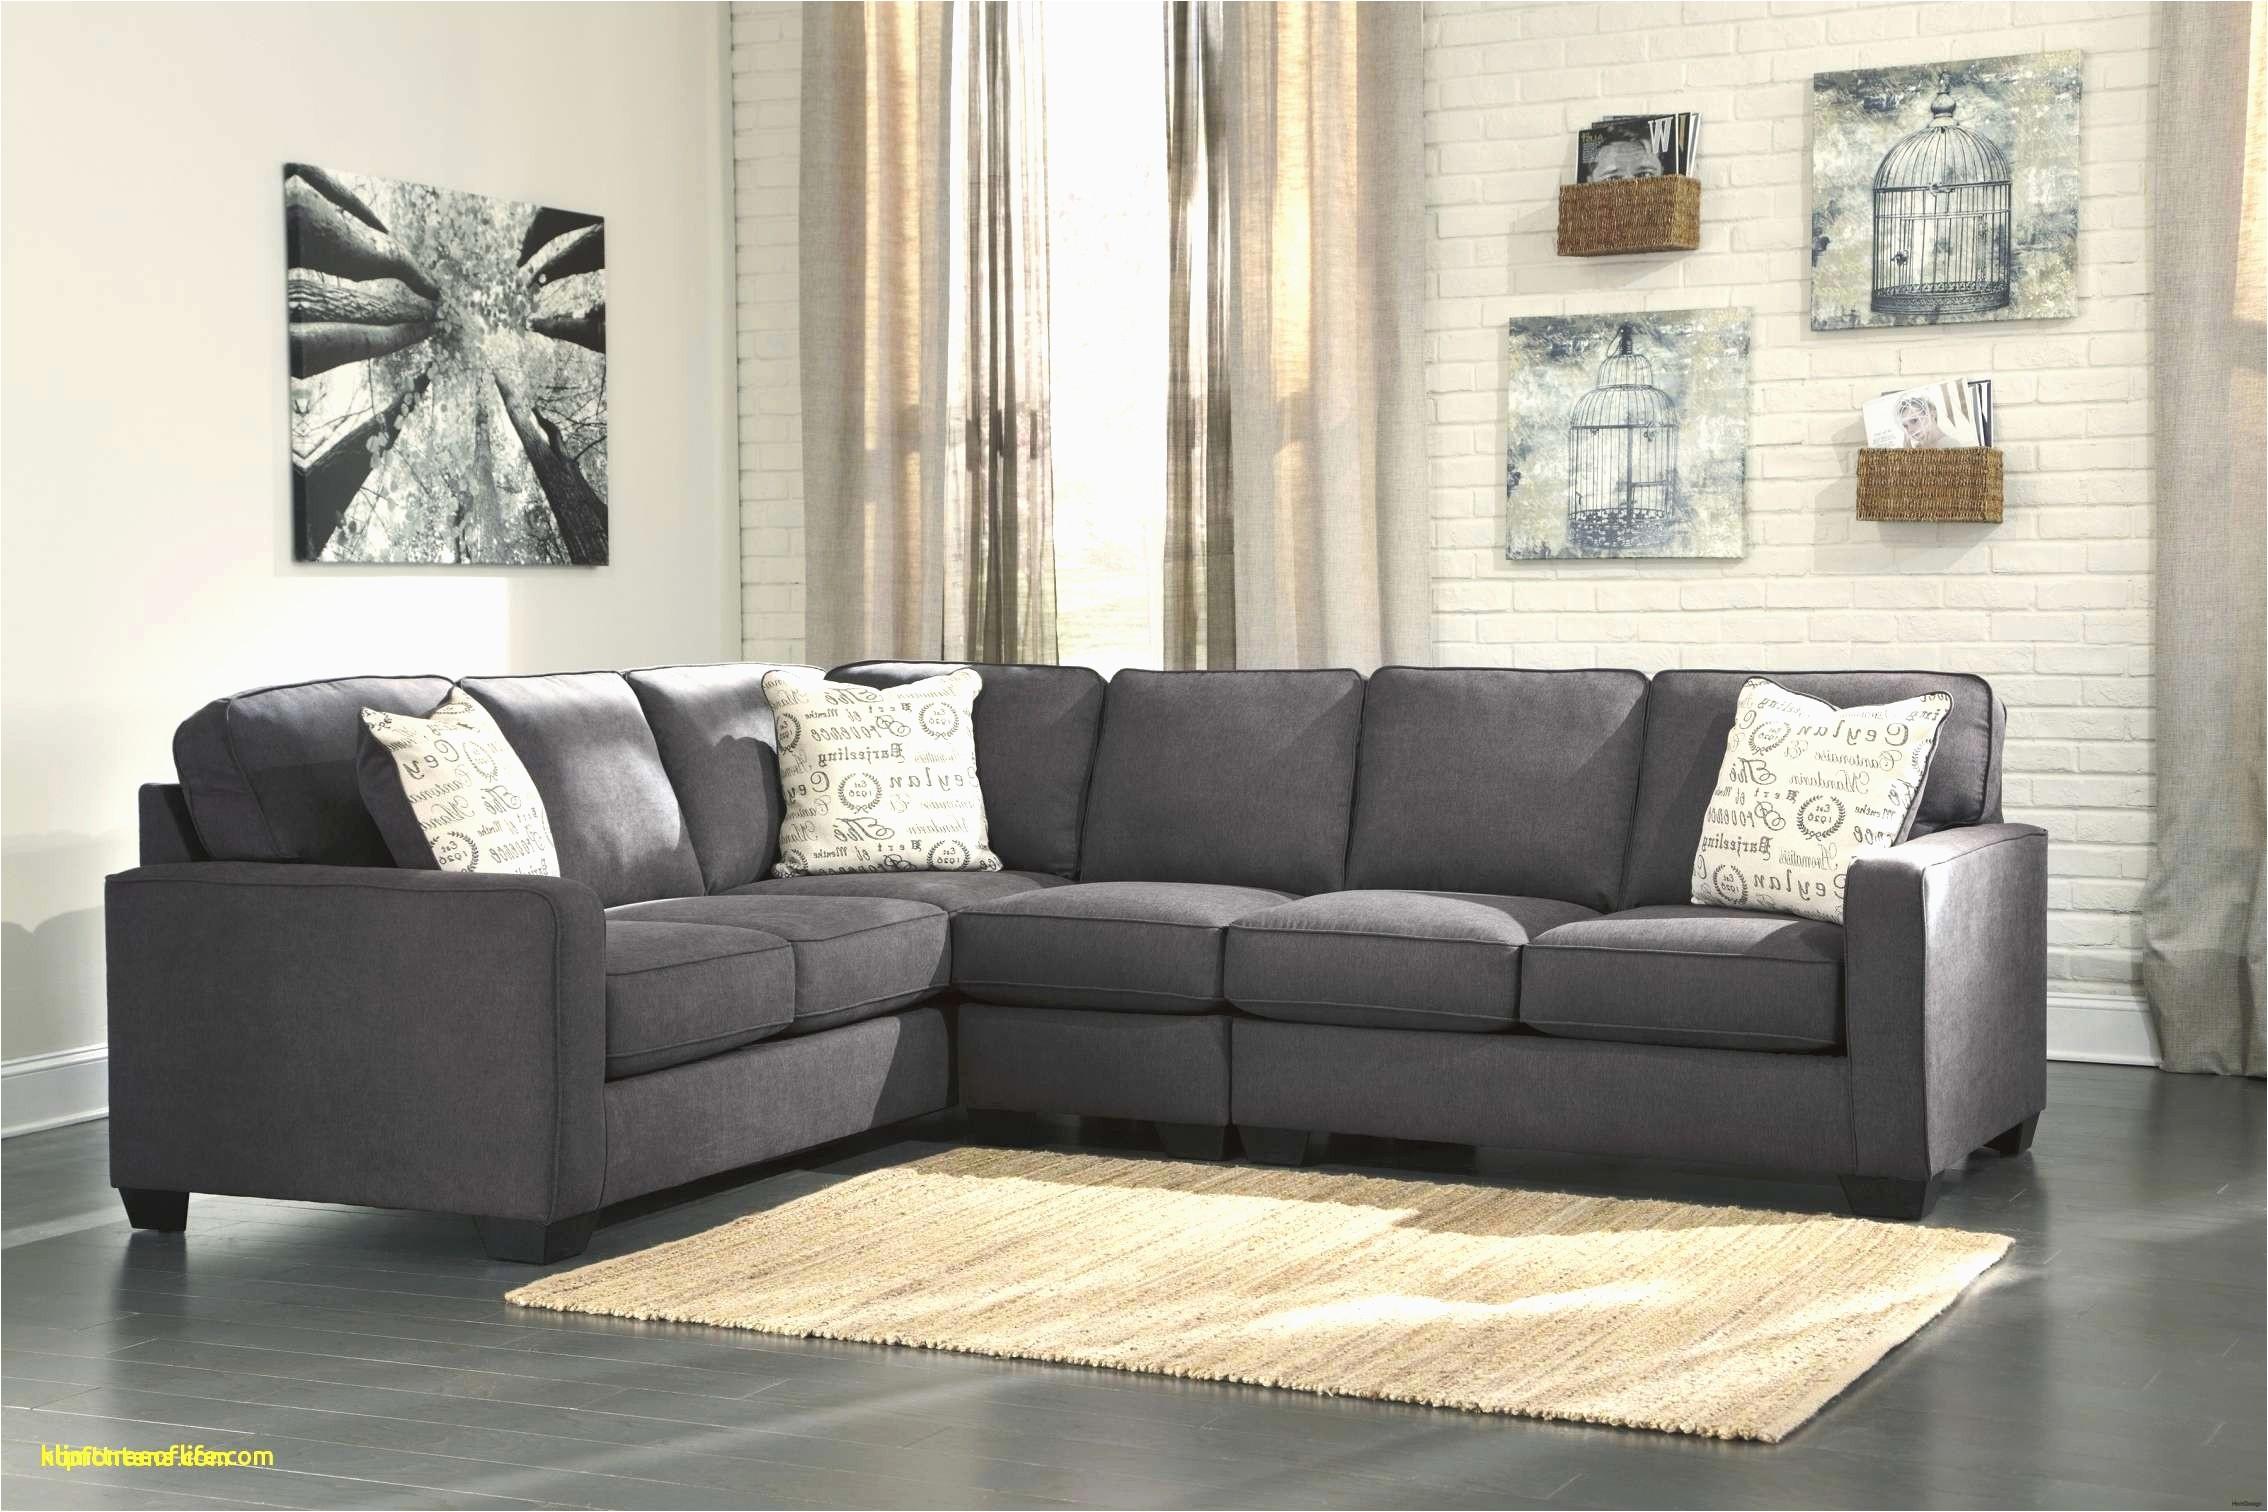 29 awesome ashleyfurniture com sofas graphics